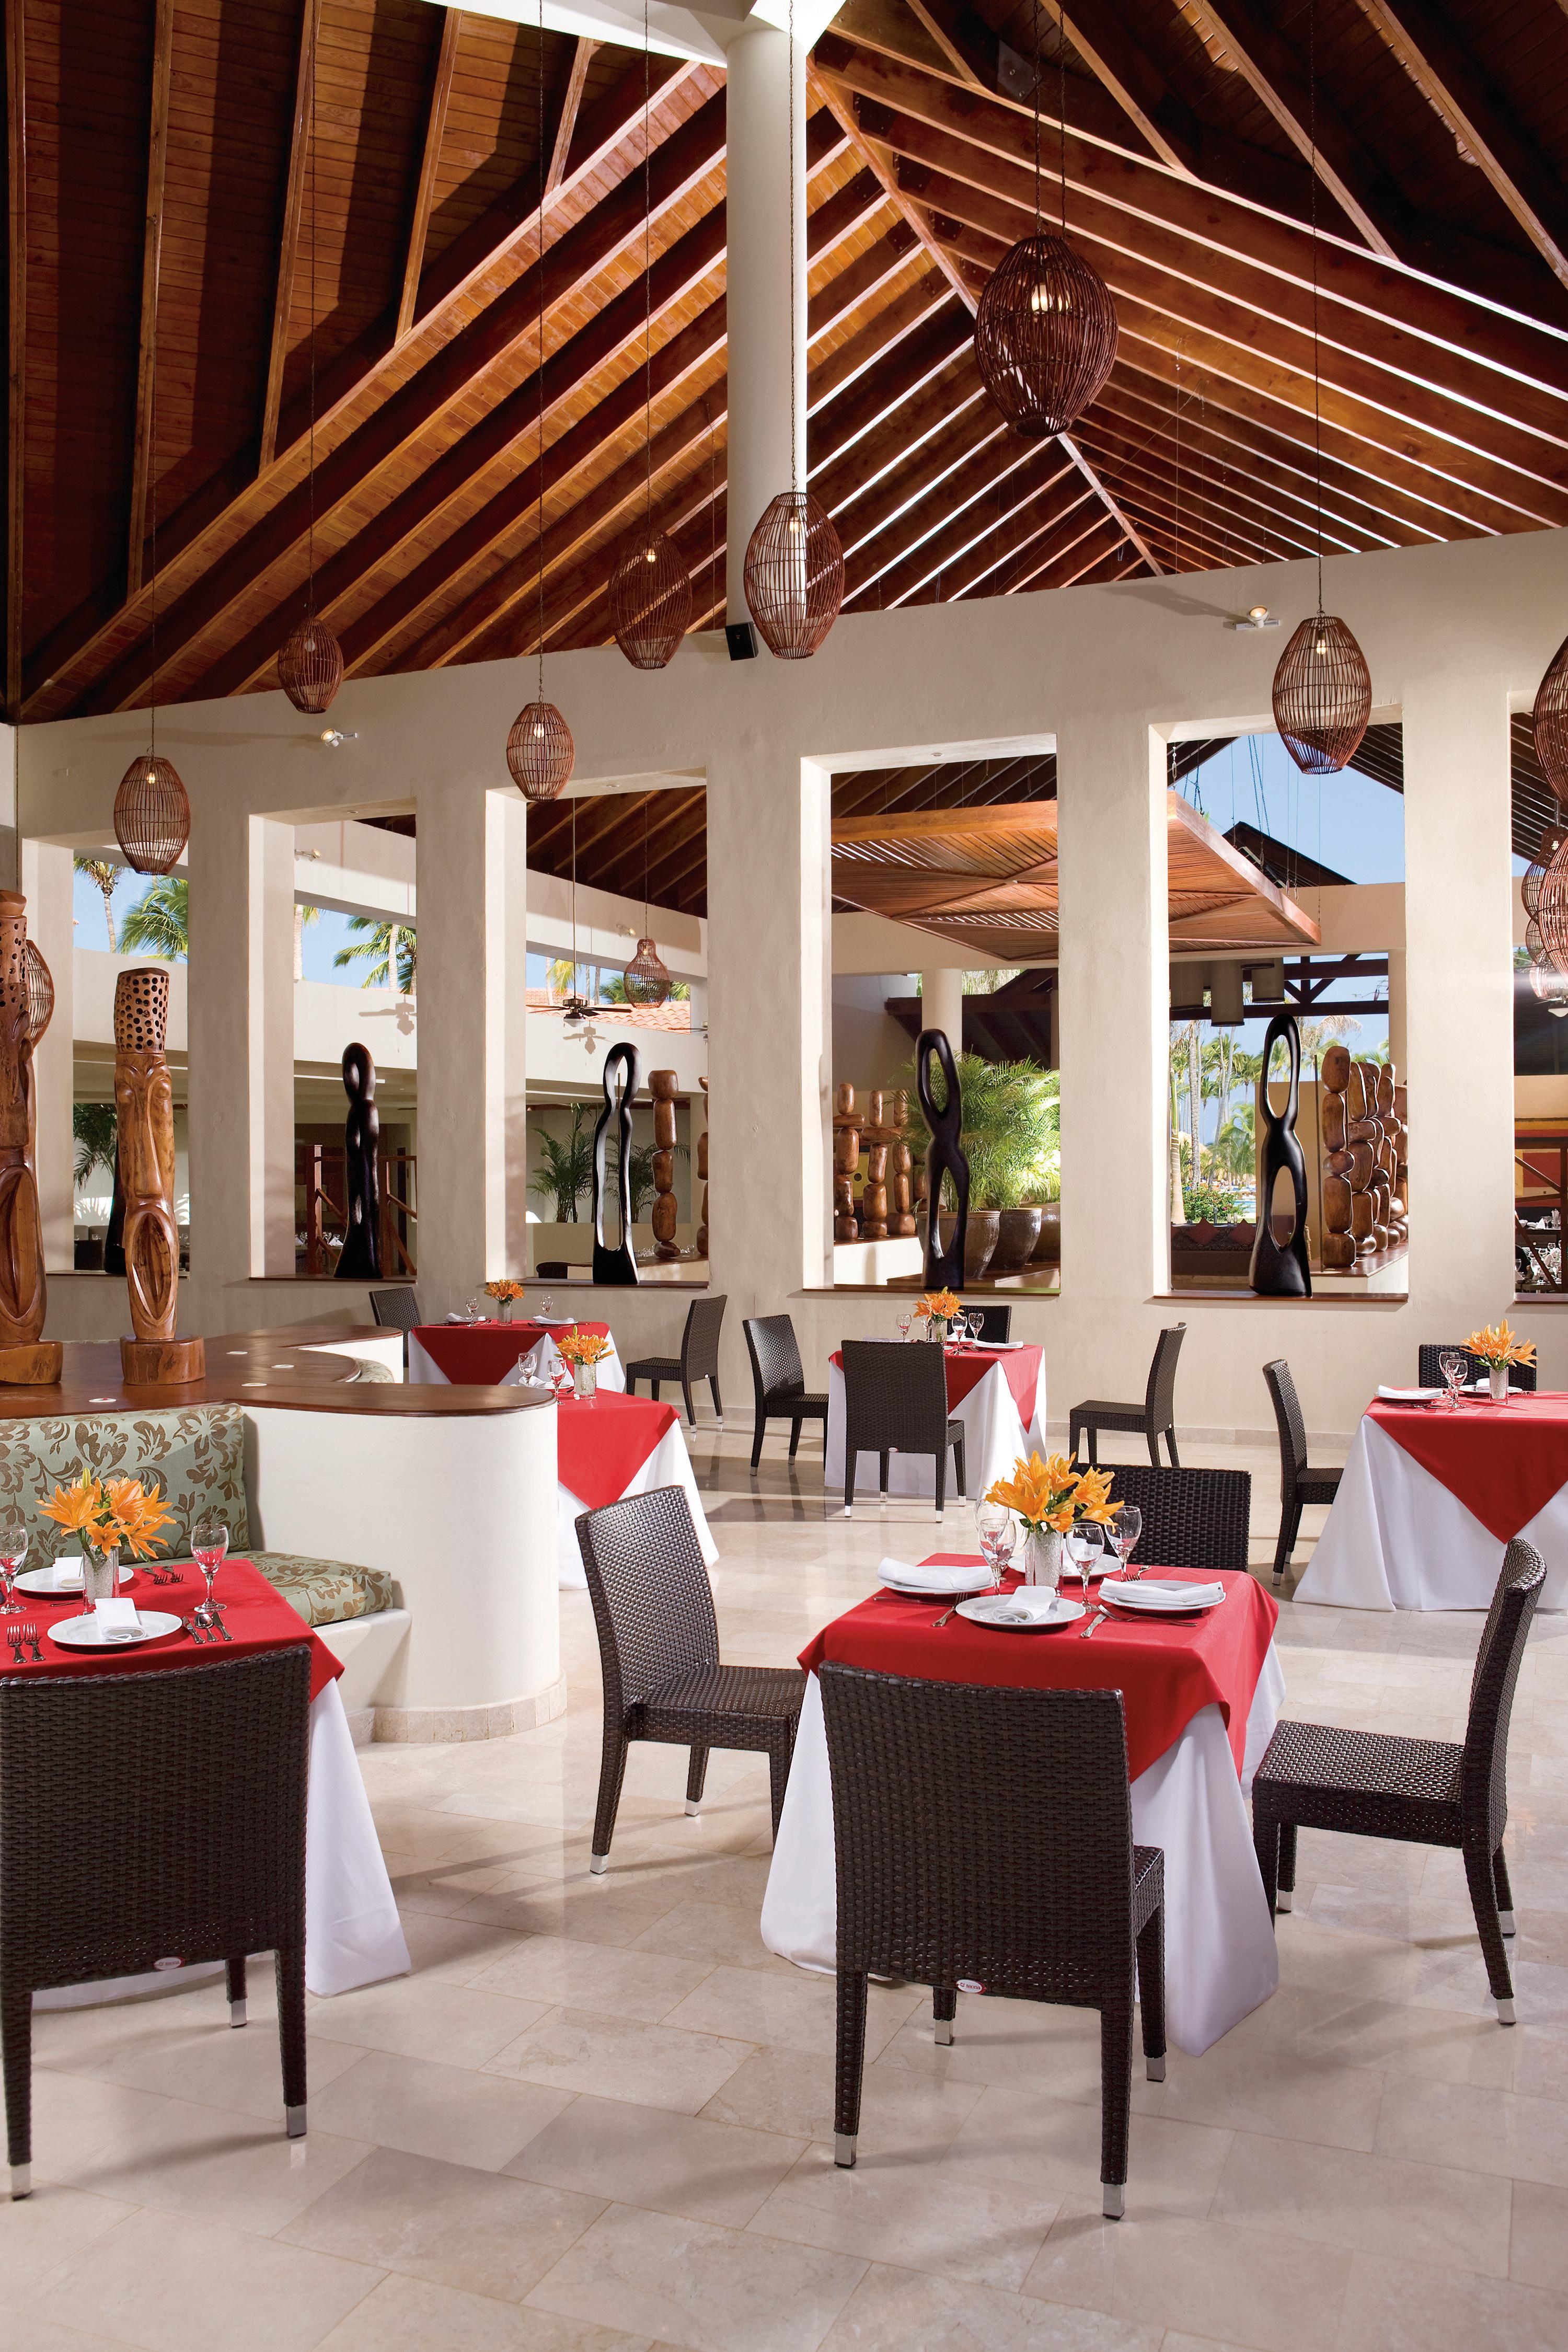 Travel Agency All-Inclusive Resort Dreams Palm Beach 44